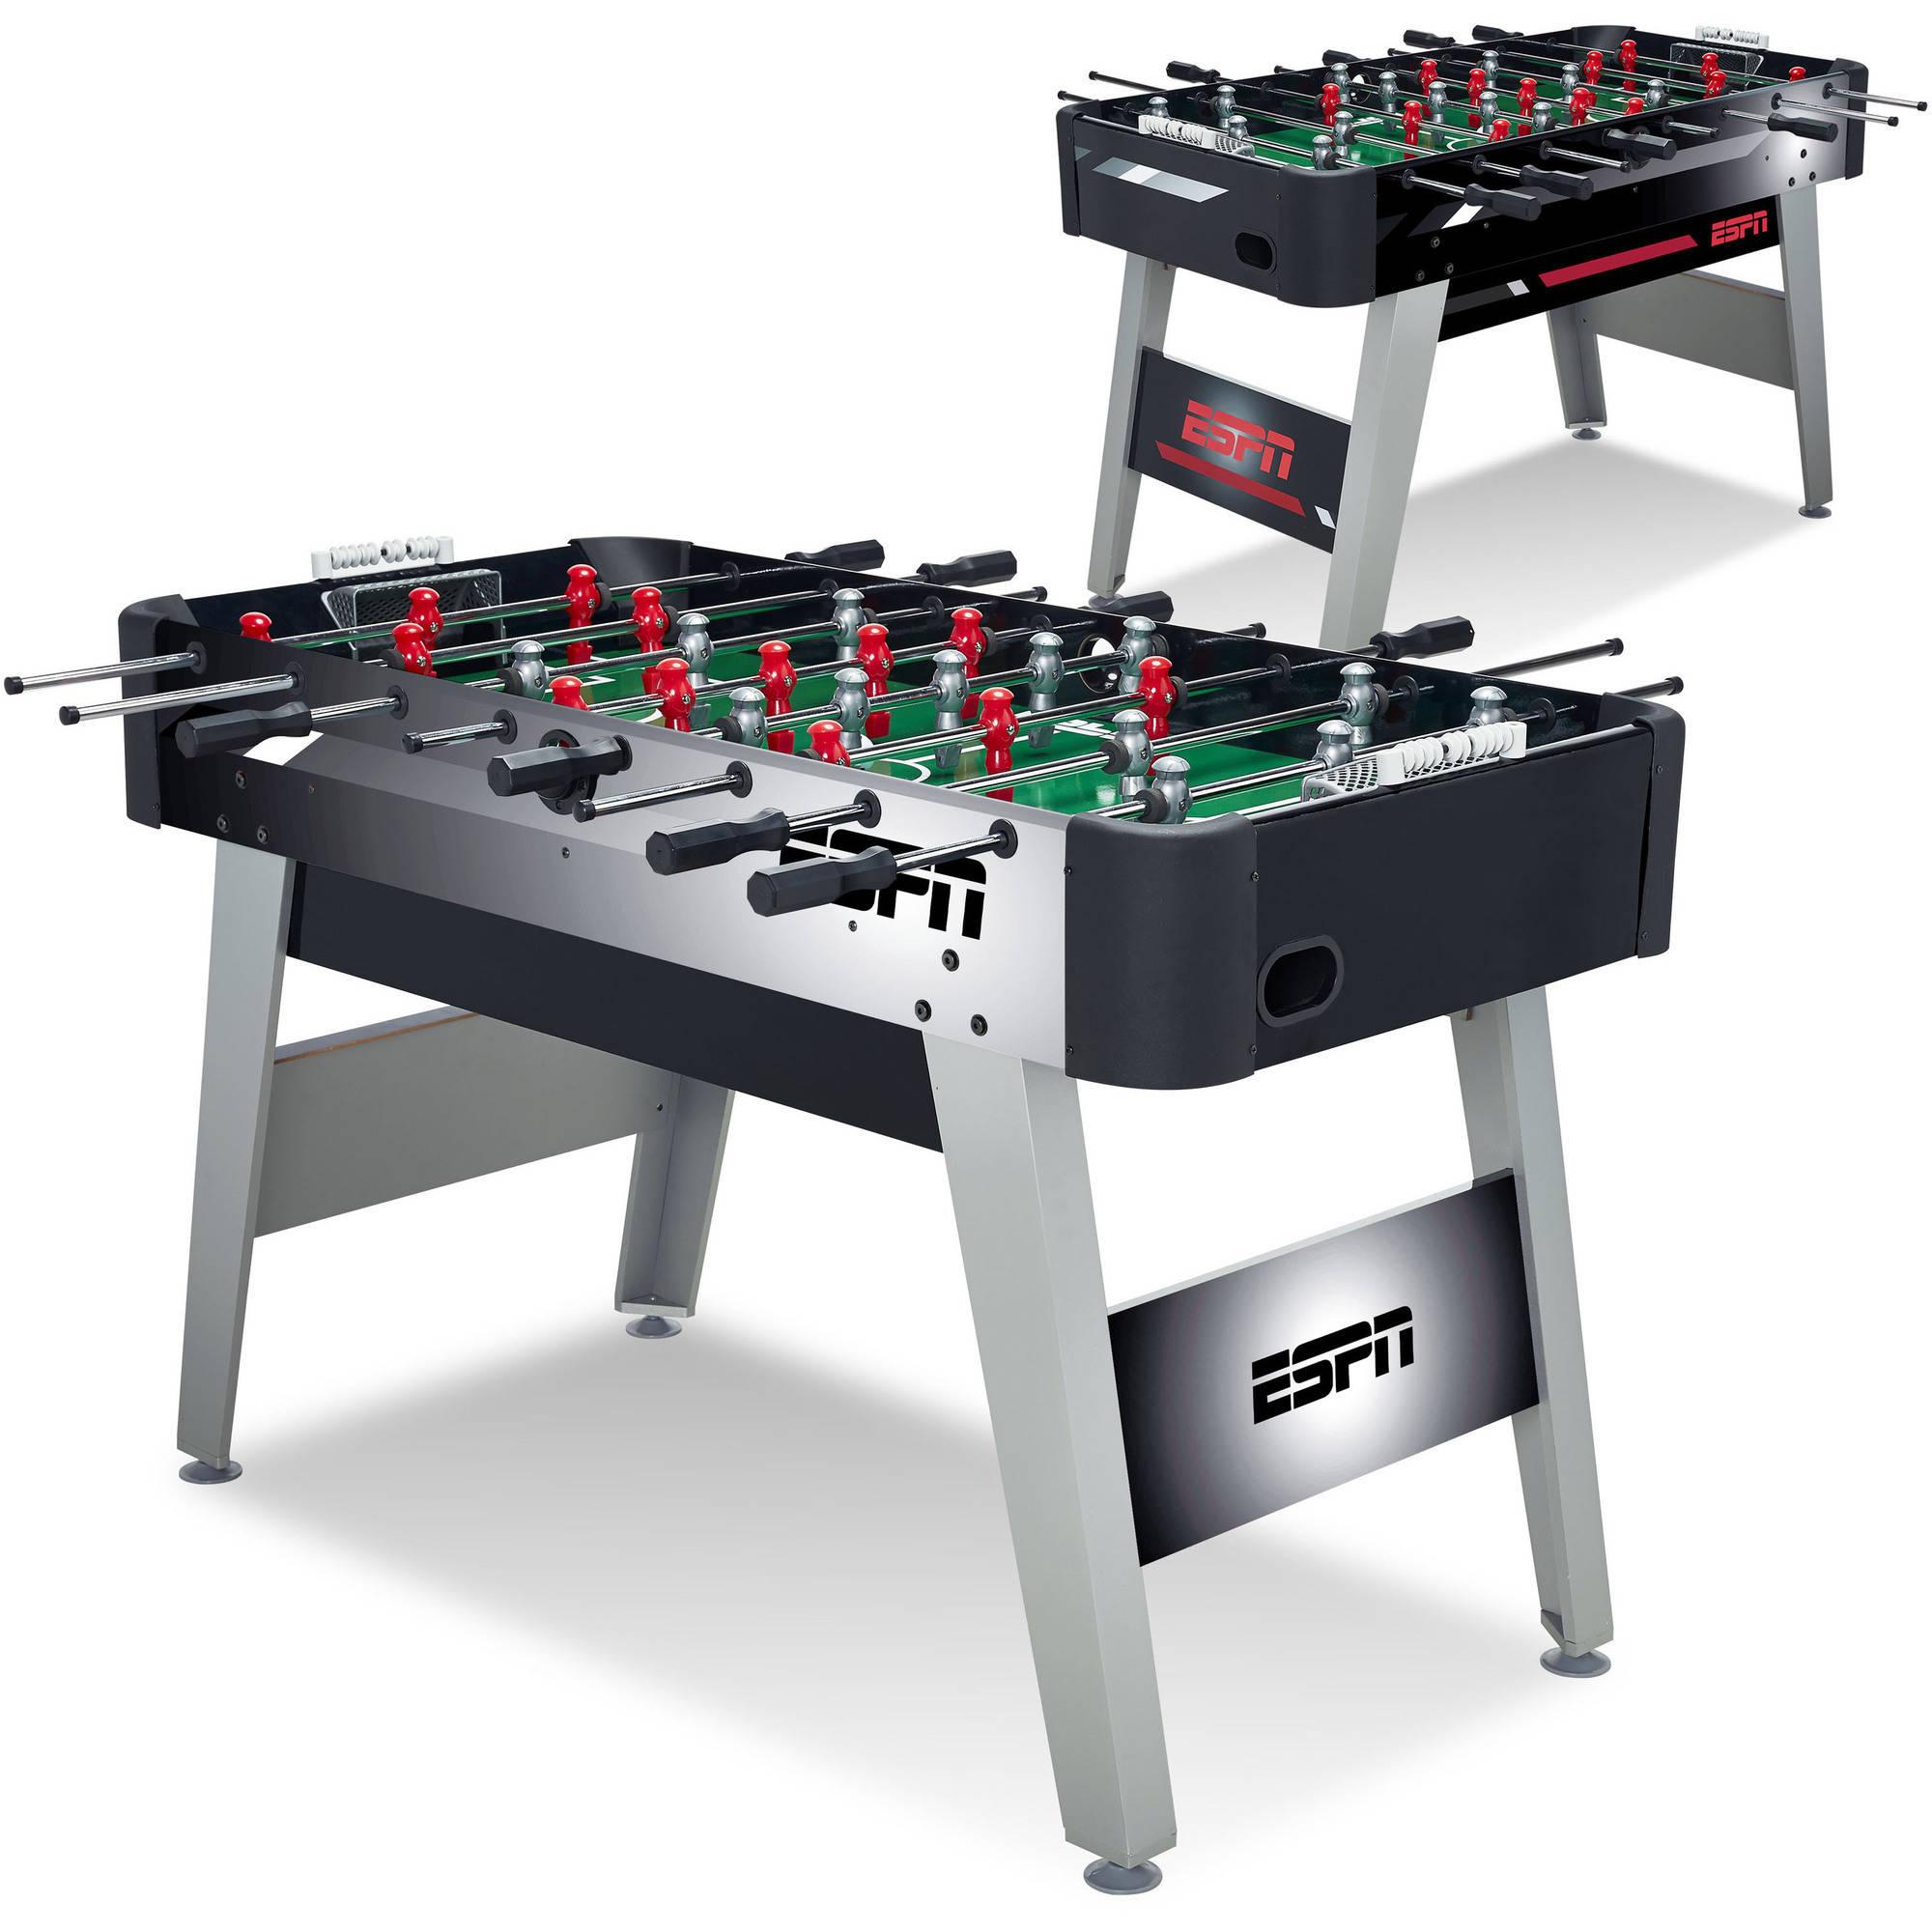 ESPN Foosball Table Walmartcom - Foosball table light